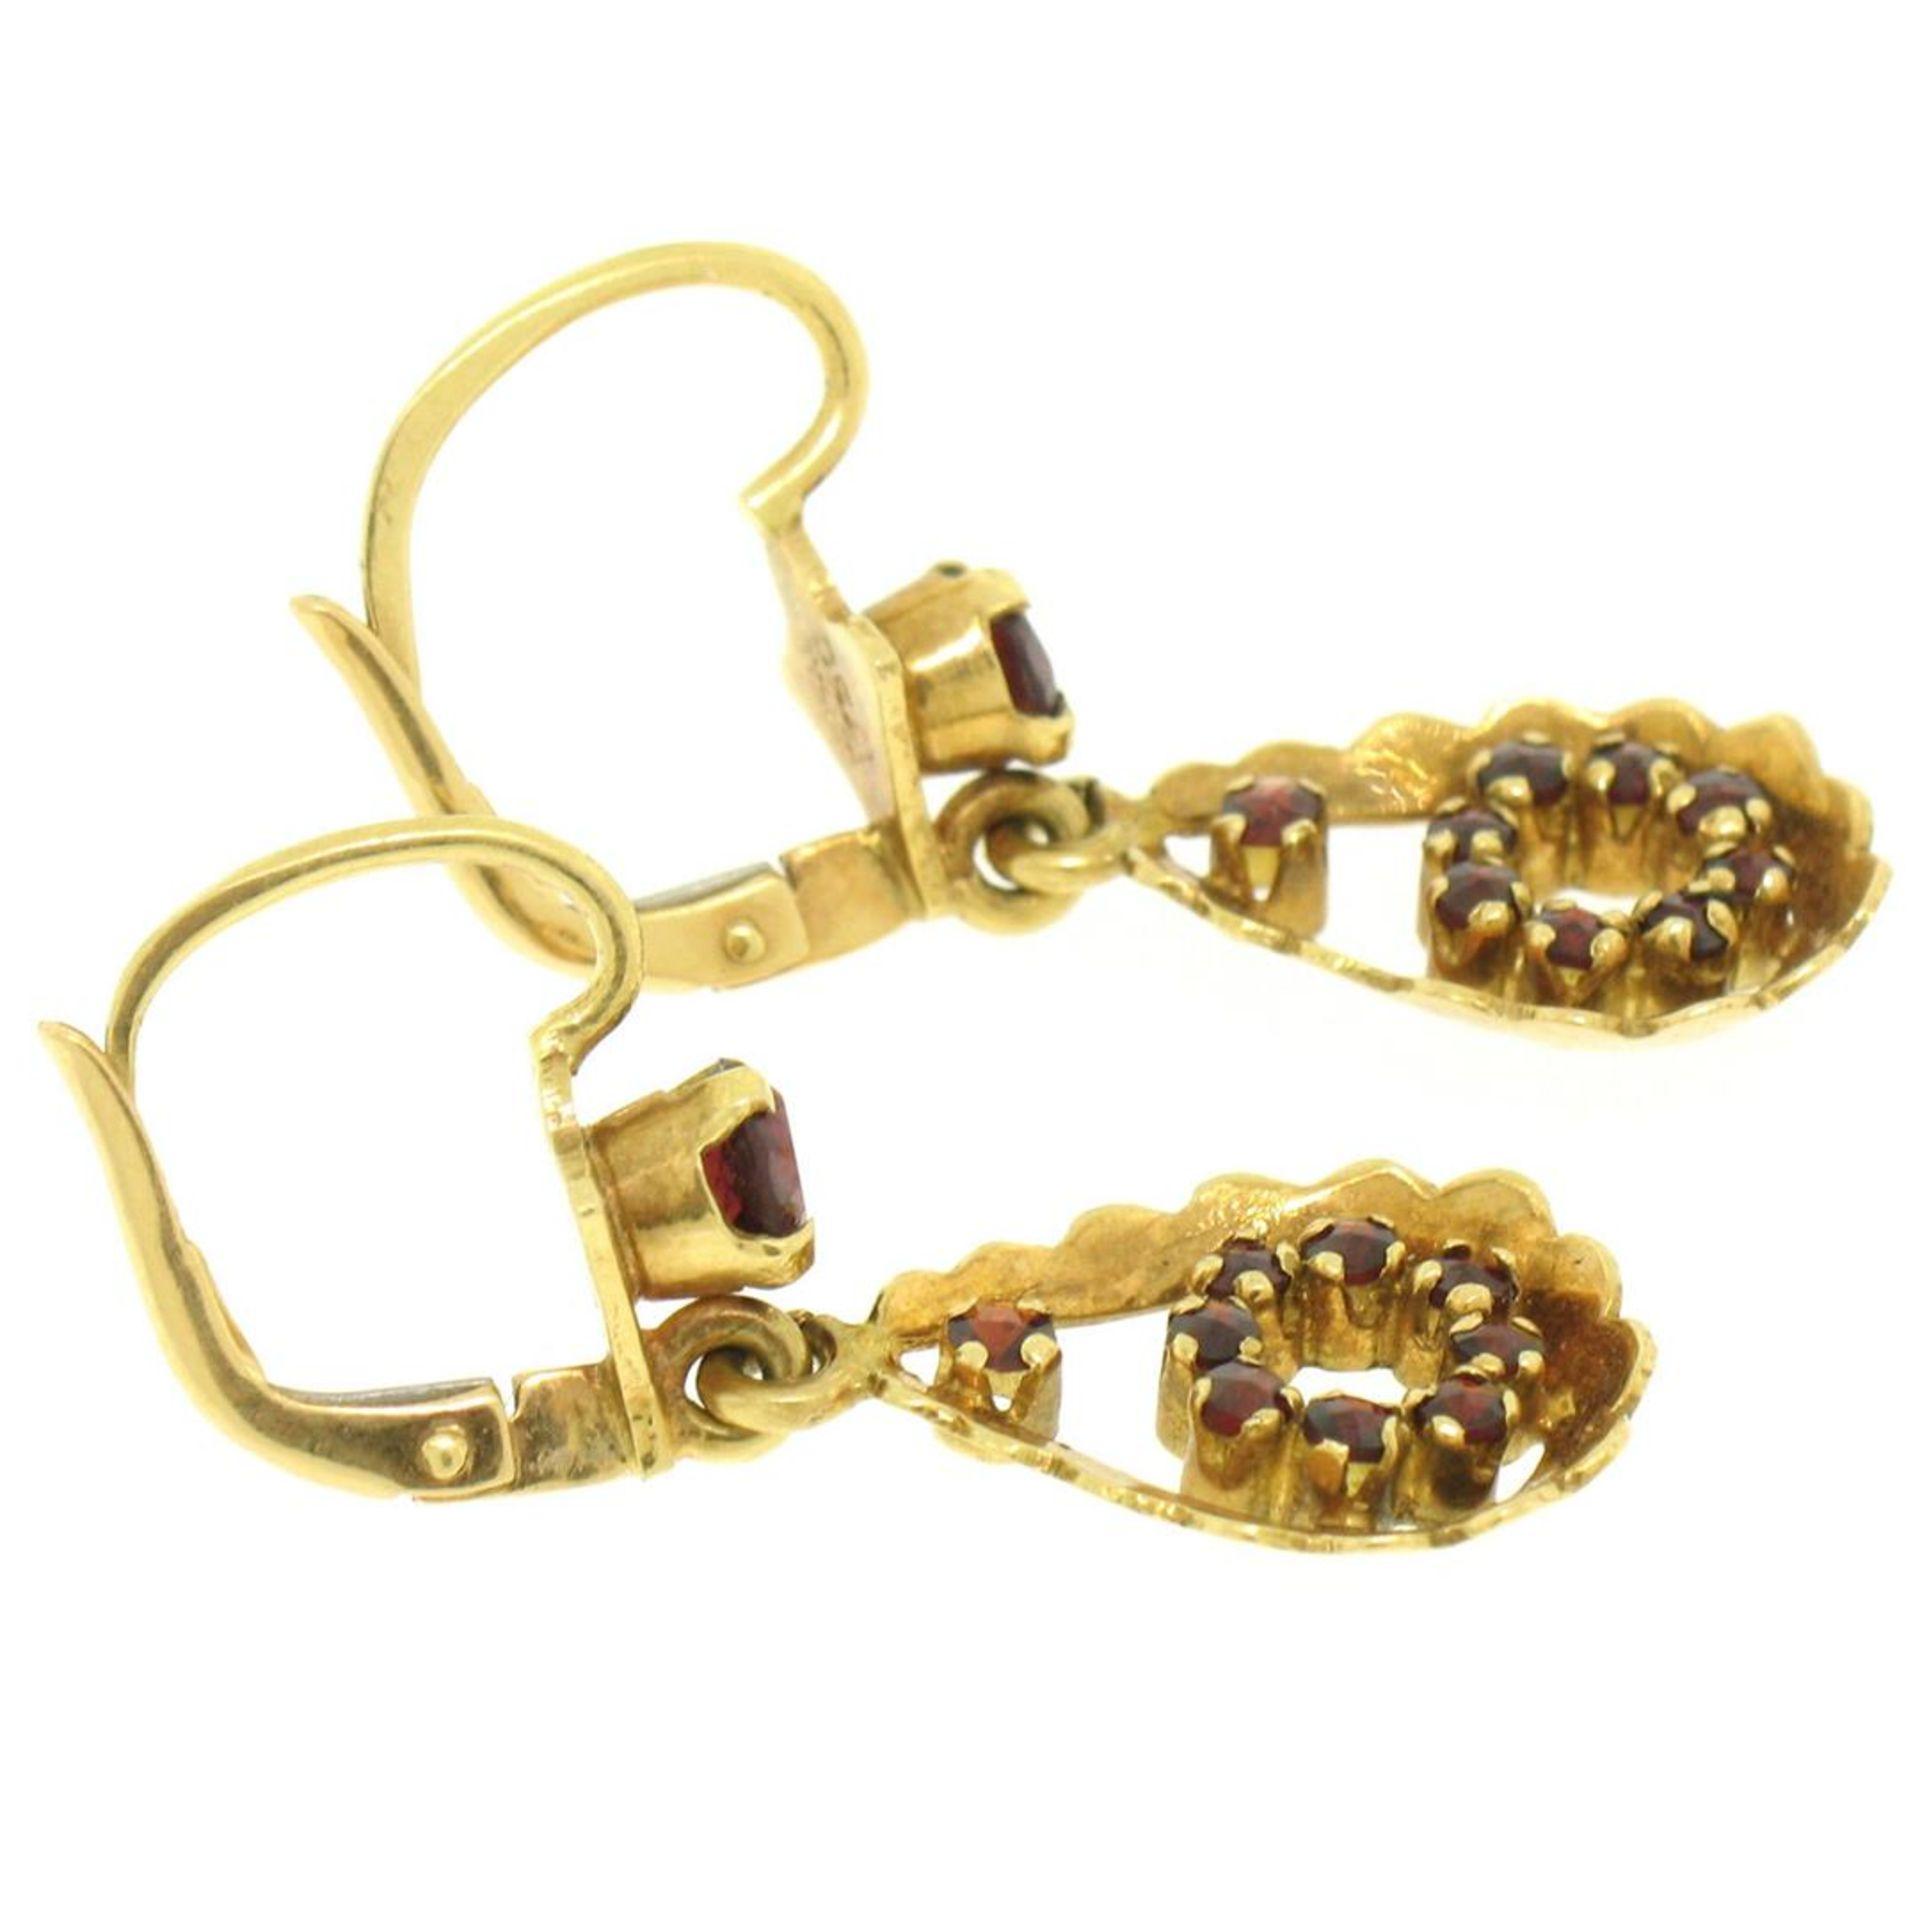 Vintage 18K Yellow Gold 1.0 ctw Pear Shape Garnet Dangle Drop Lever Back Earring - Image 8 of 8